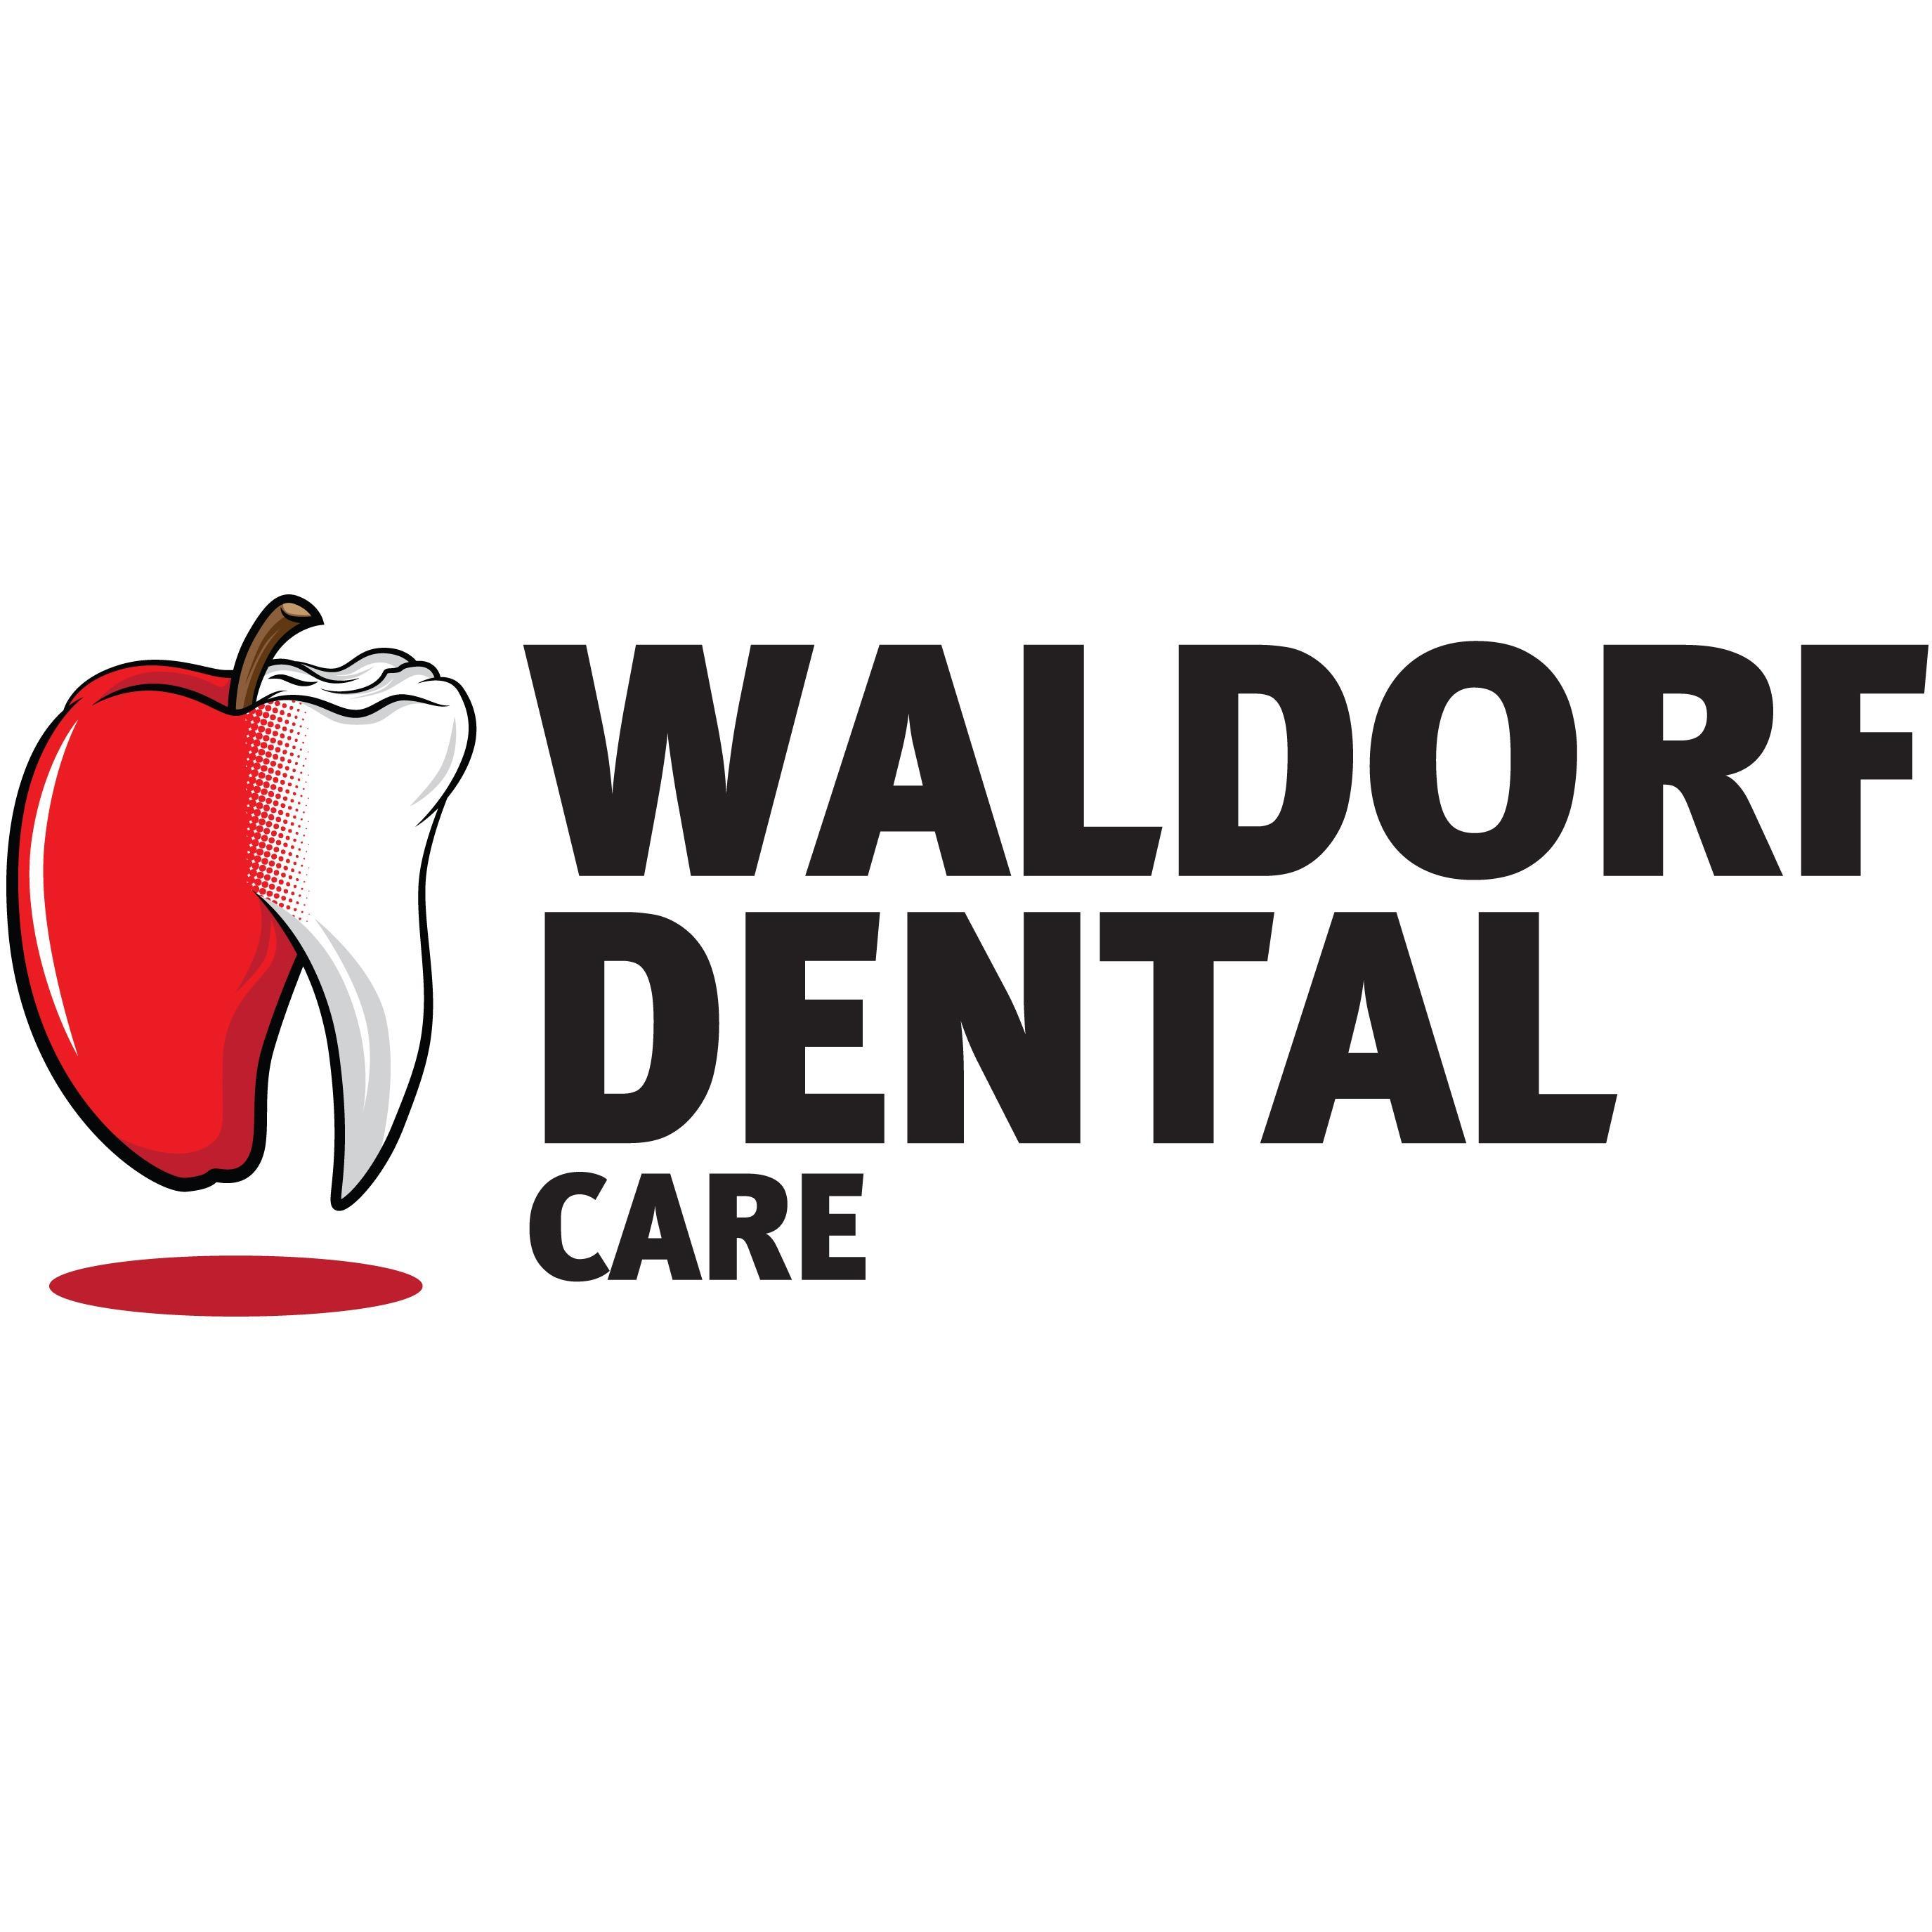 Waldorf Dental Care